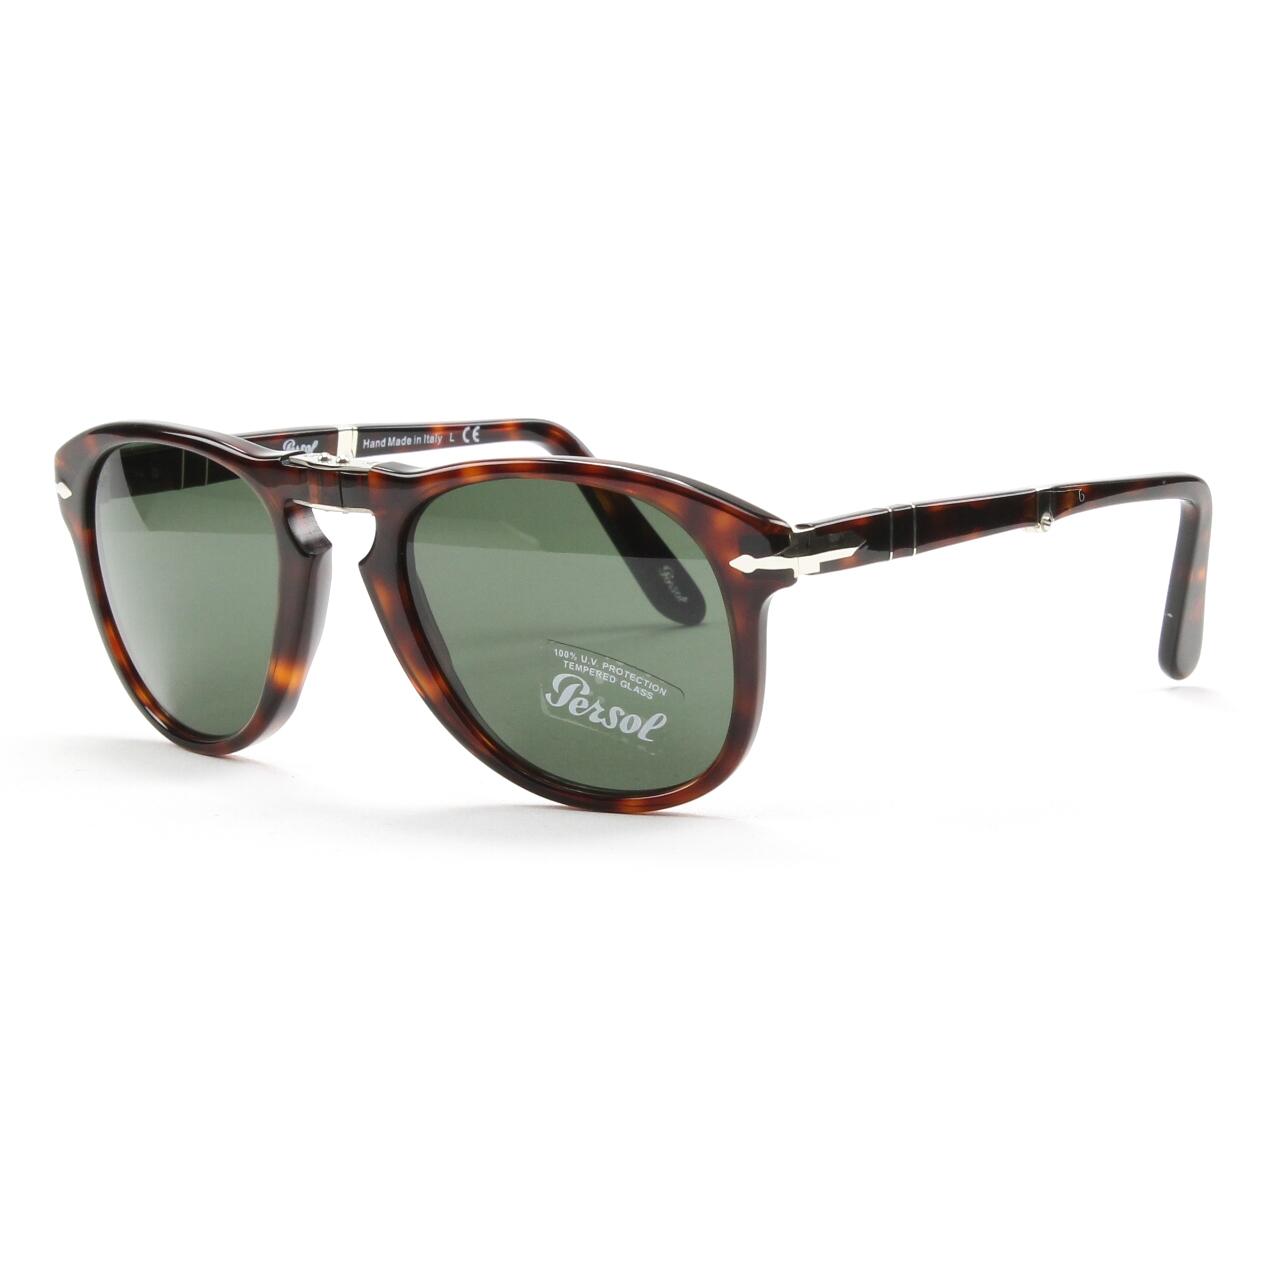 Persol 714 Folding Sunglasses 24/31 Brown Havana, Grey Crystal Lens PO0714 52mm | eBay